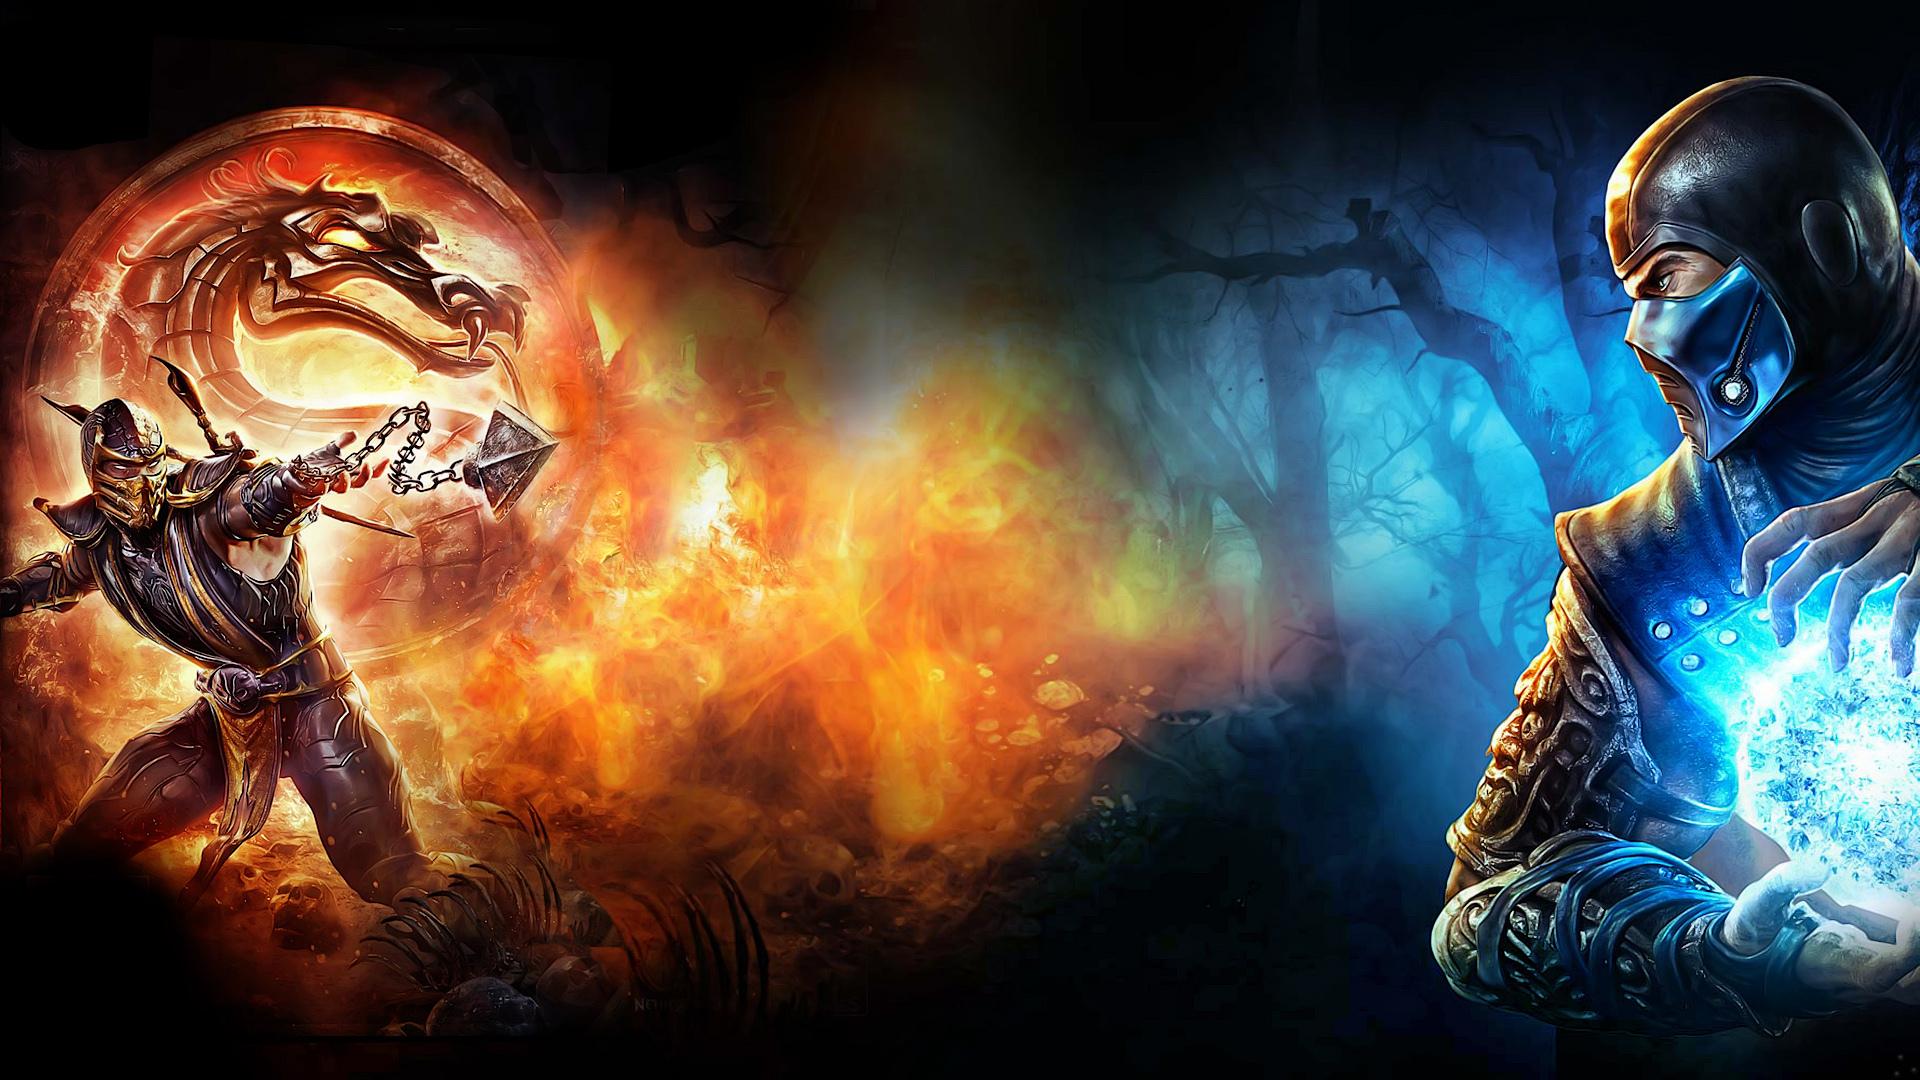 Mortal-Kombat-Scorpion-Sub-Zero-Wallpaper-HD-Dekstop